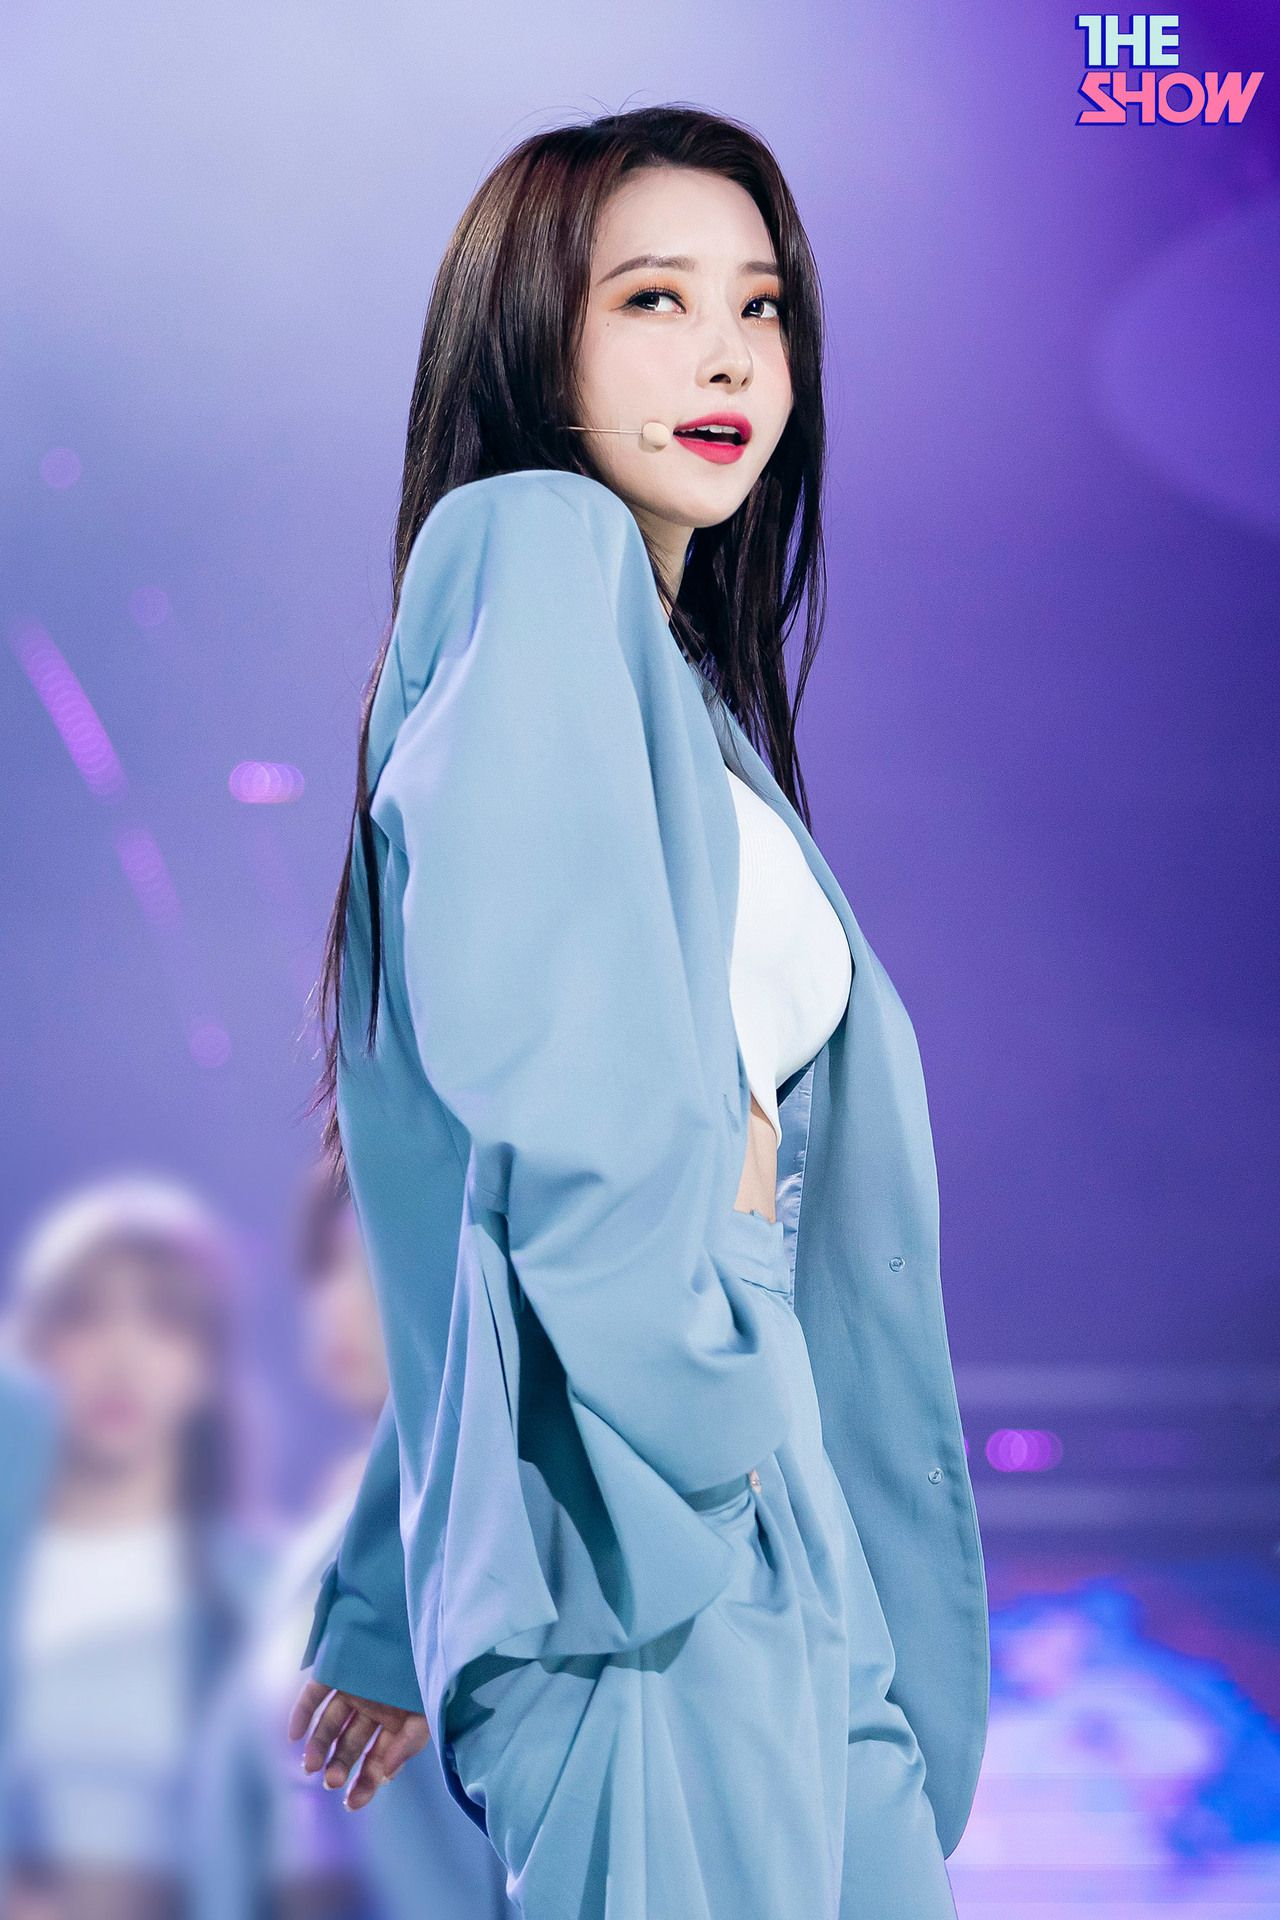 Pin By Lov3 Got7 Yugyeom On Korean Kpop Fashion And Makeup 3 Dream Catcher Kpop Girls Asian Celebrities